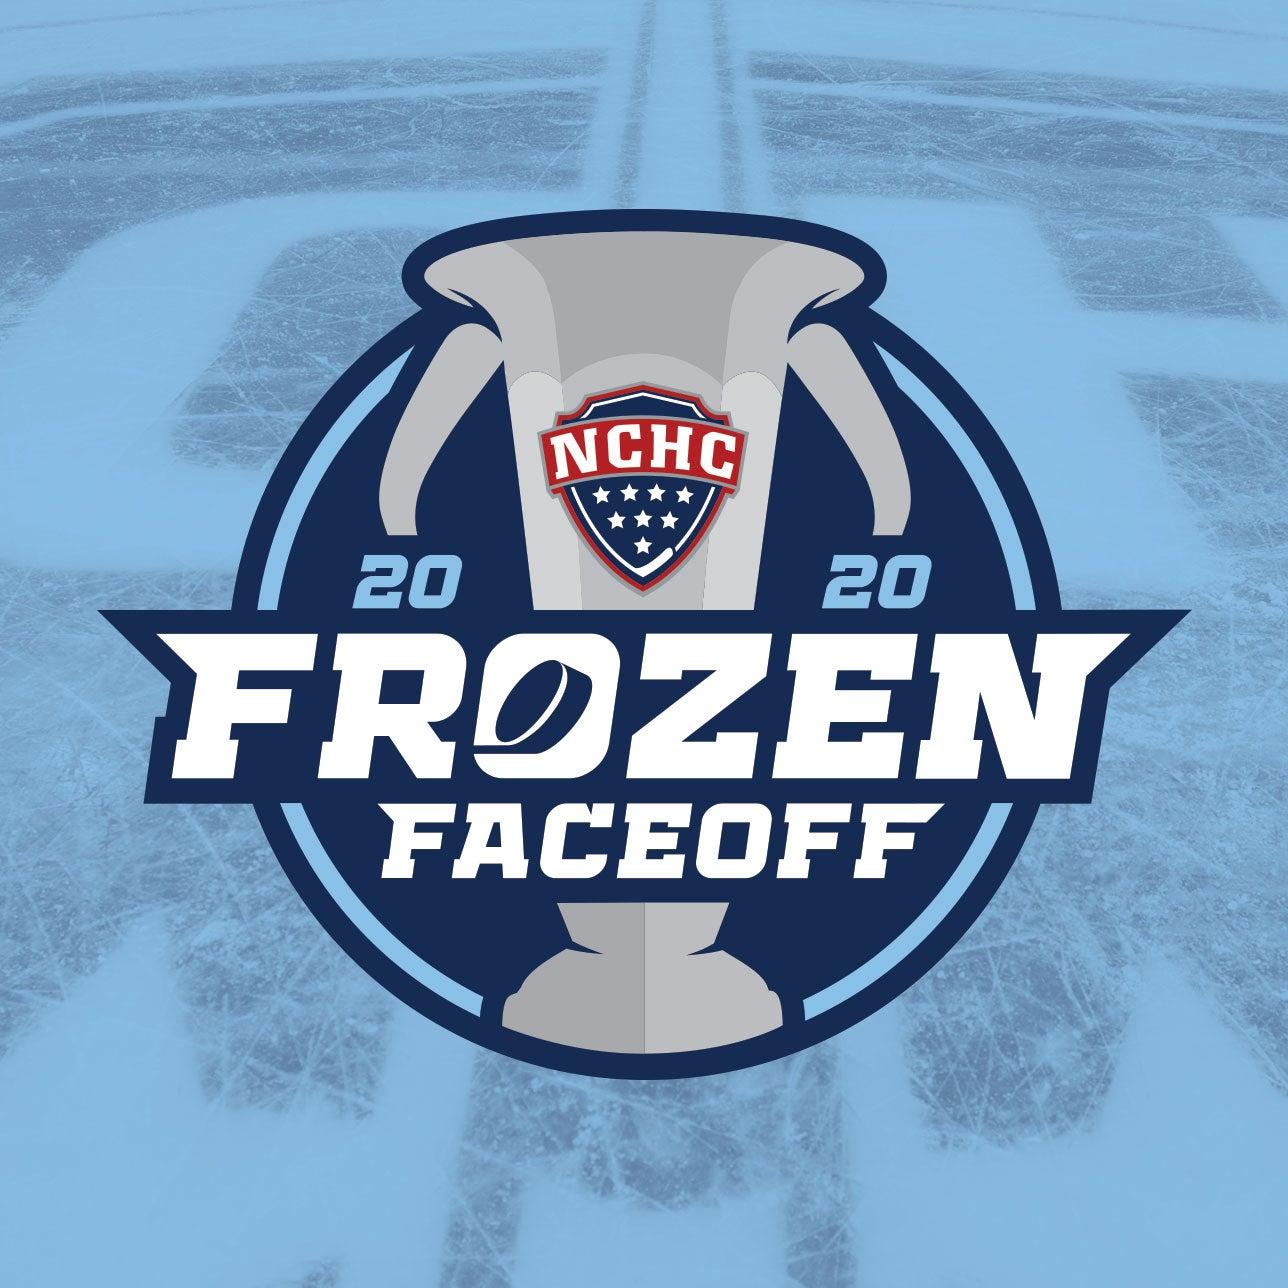 NCHC Frozen Faceoff